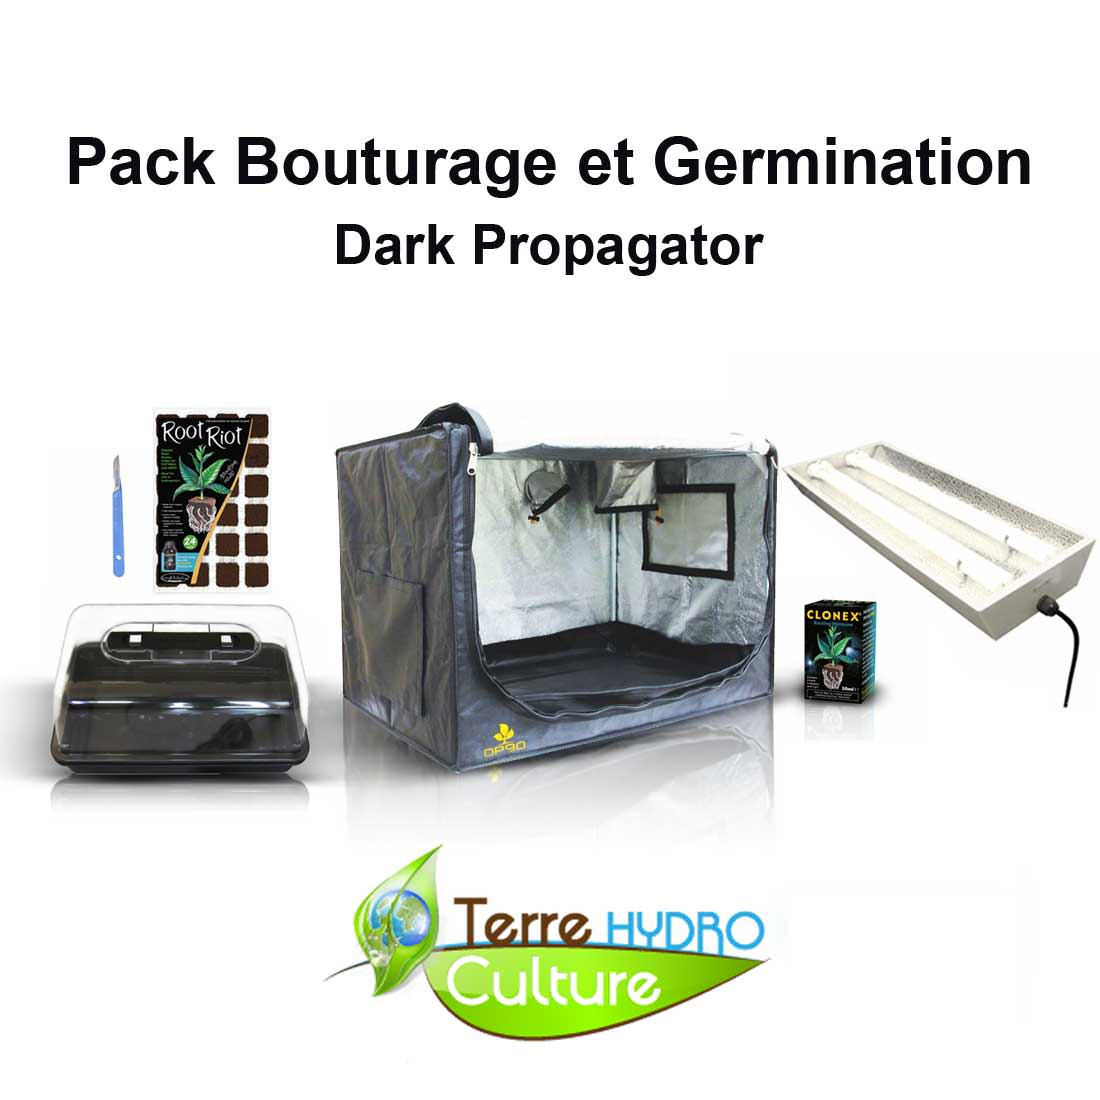 Pack bouturage indoor kit de culture discount growshop - Pack chambre de culture ...